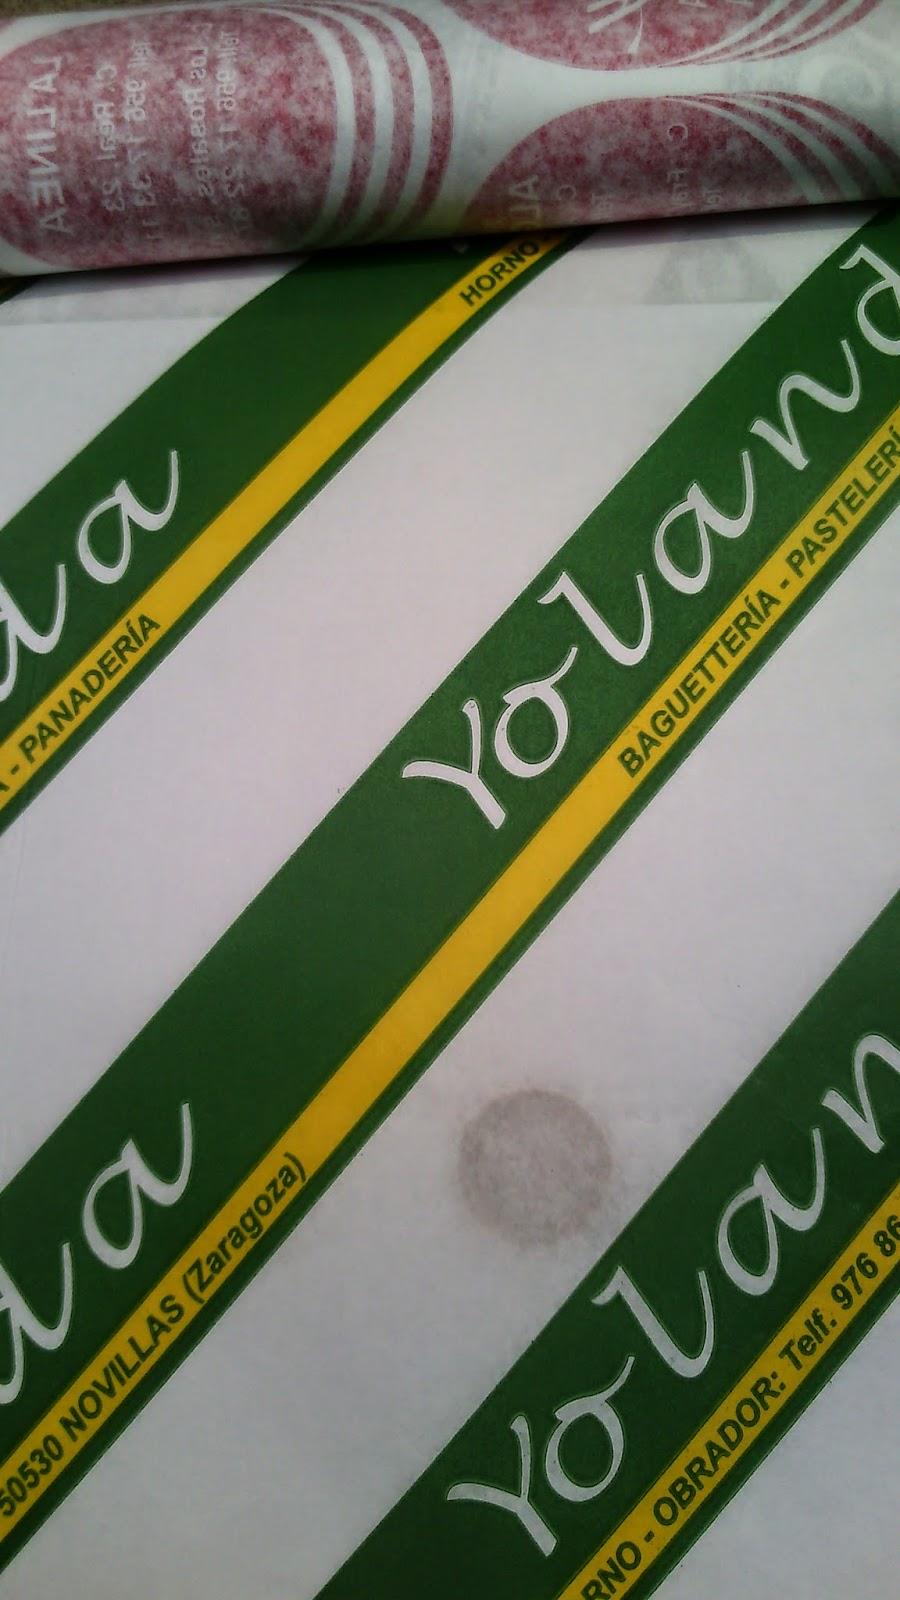 papel celulosa blanco 40 grs satinado 1 cara